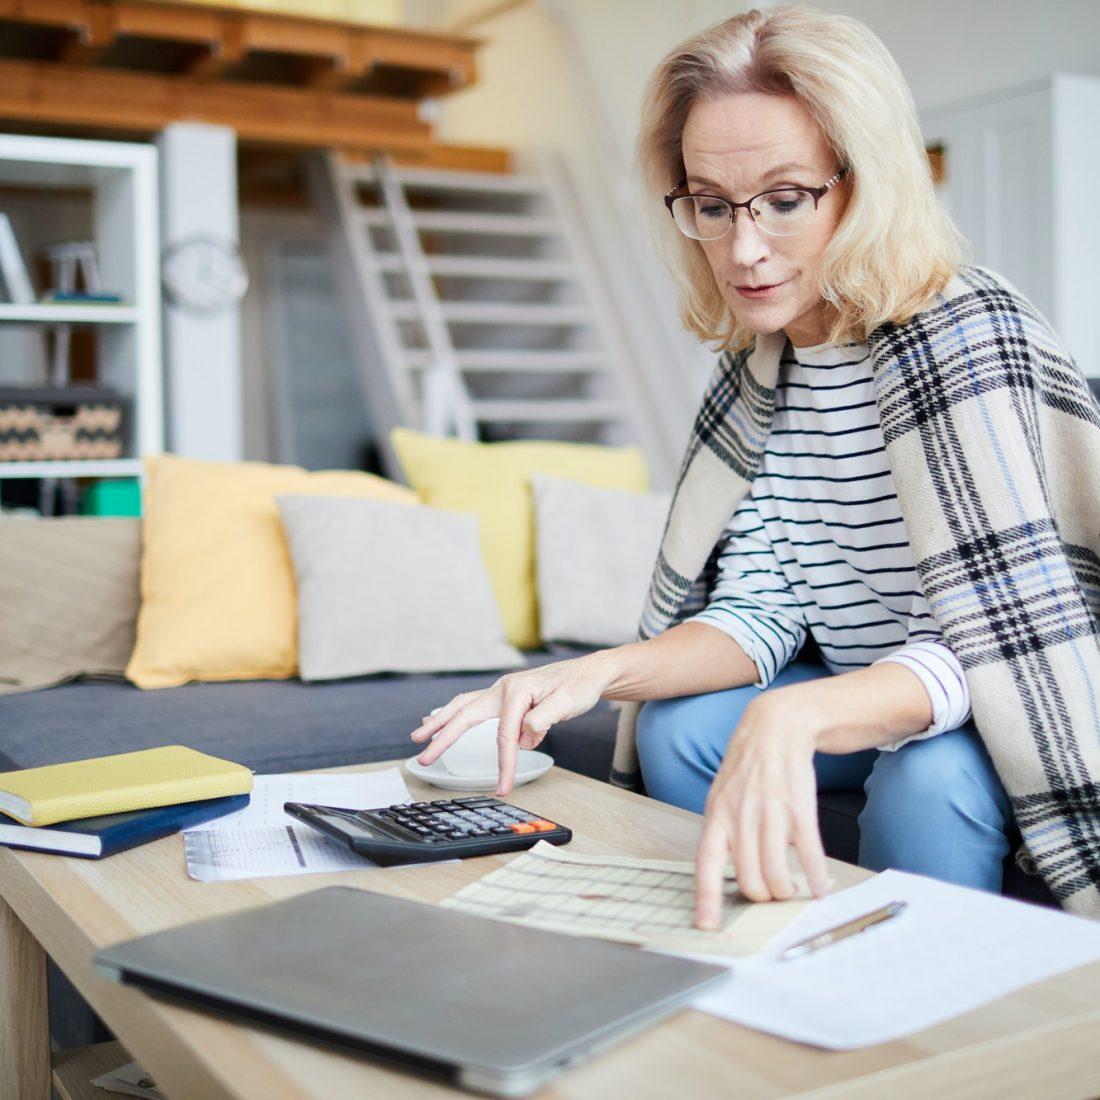 Calculating Home Budget